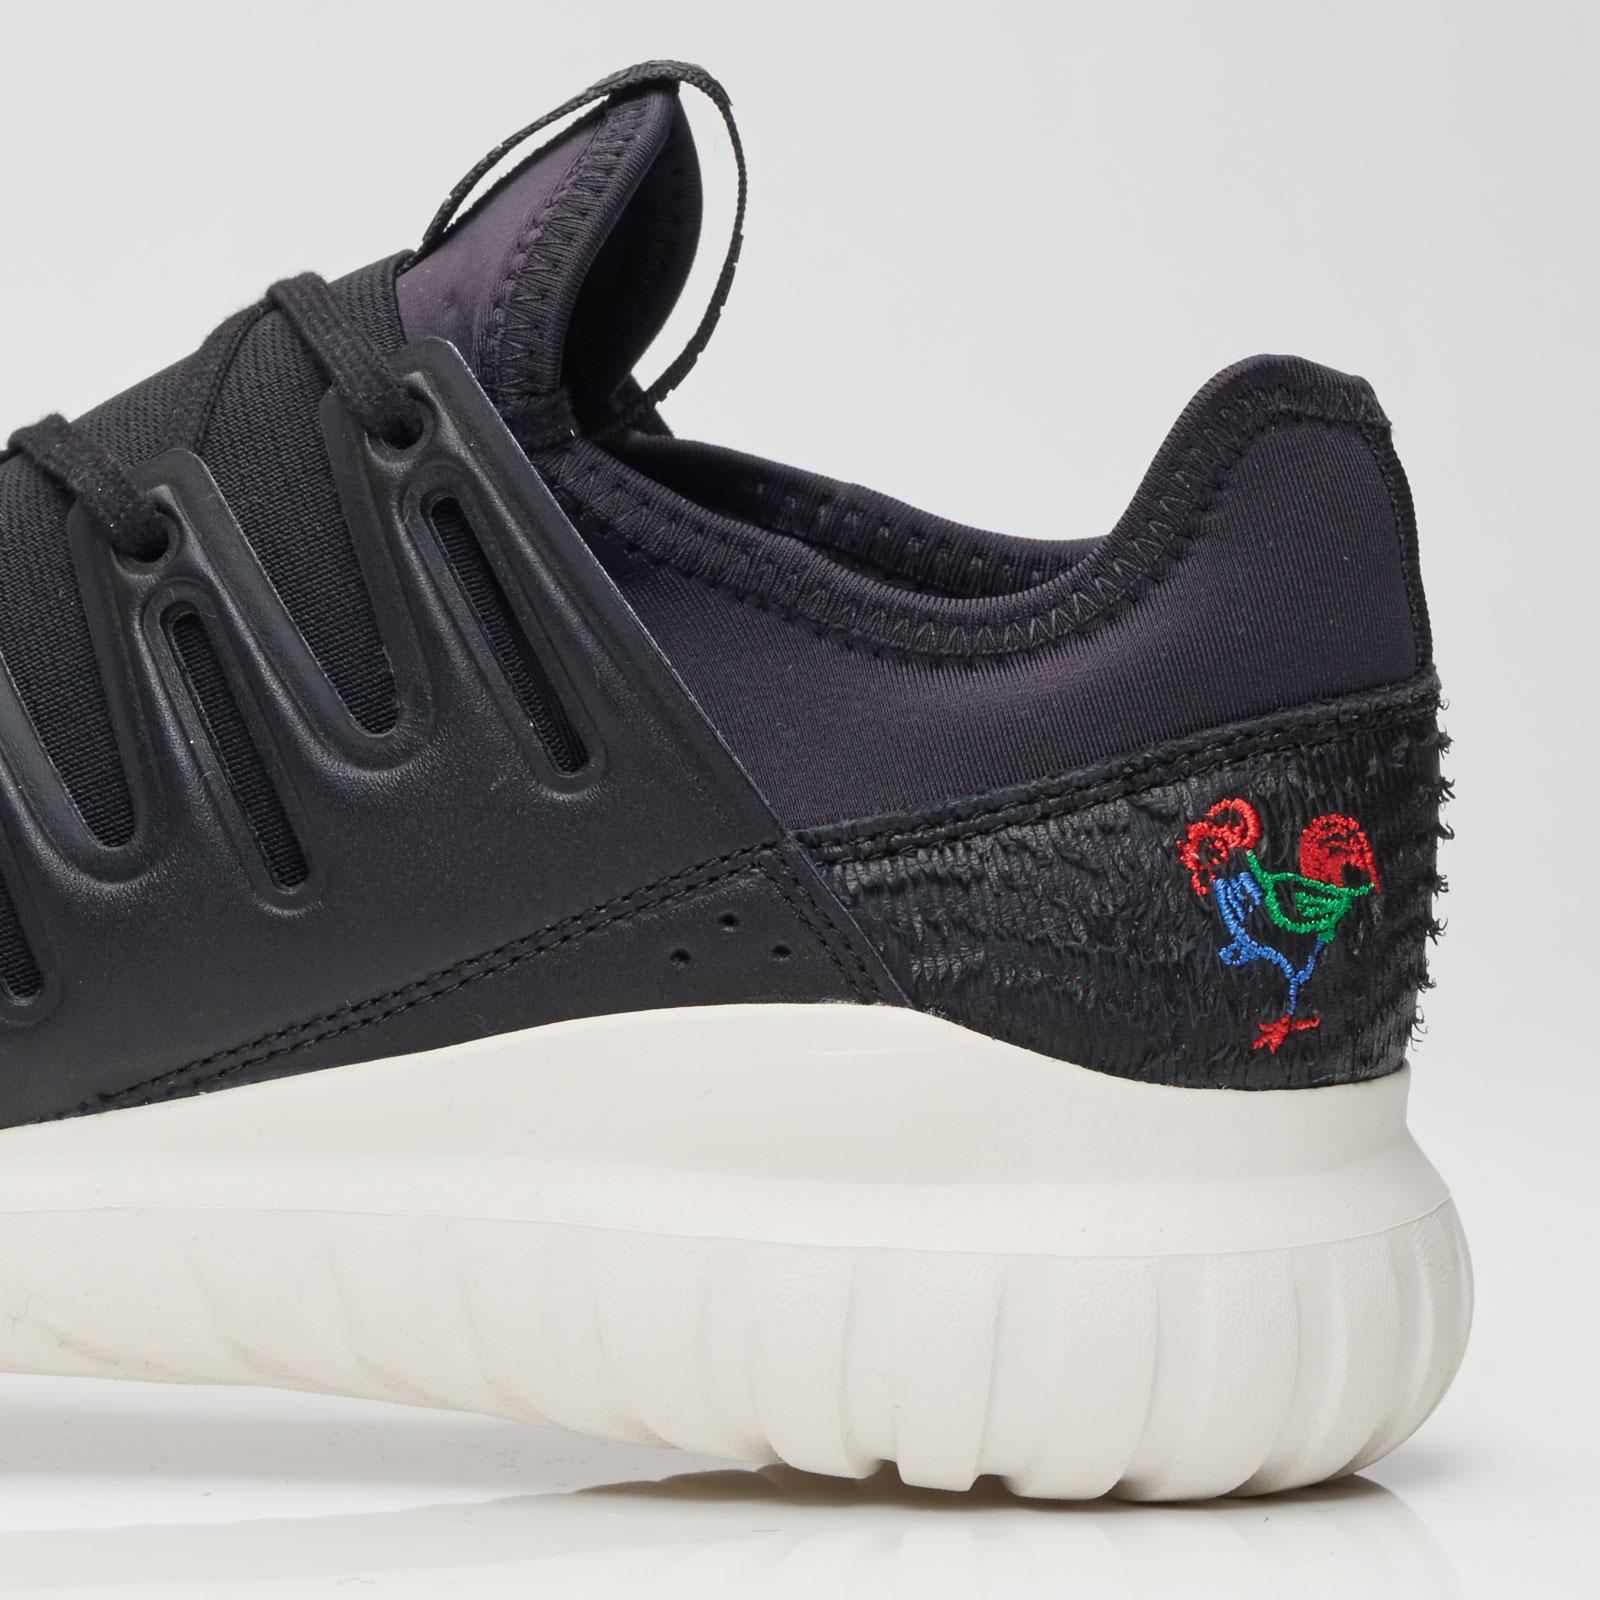 adidas Tubular Radial Cny - Ba7780 - Sneakersnstuff